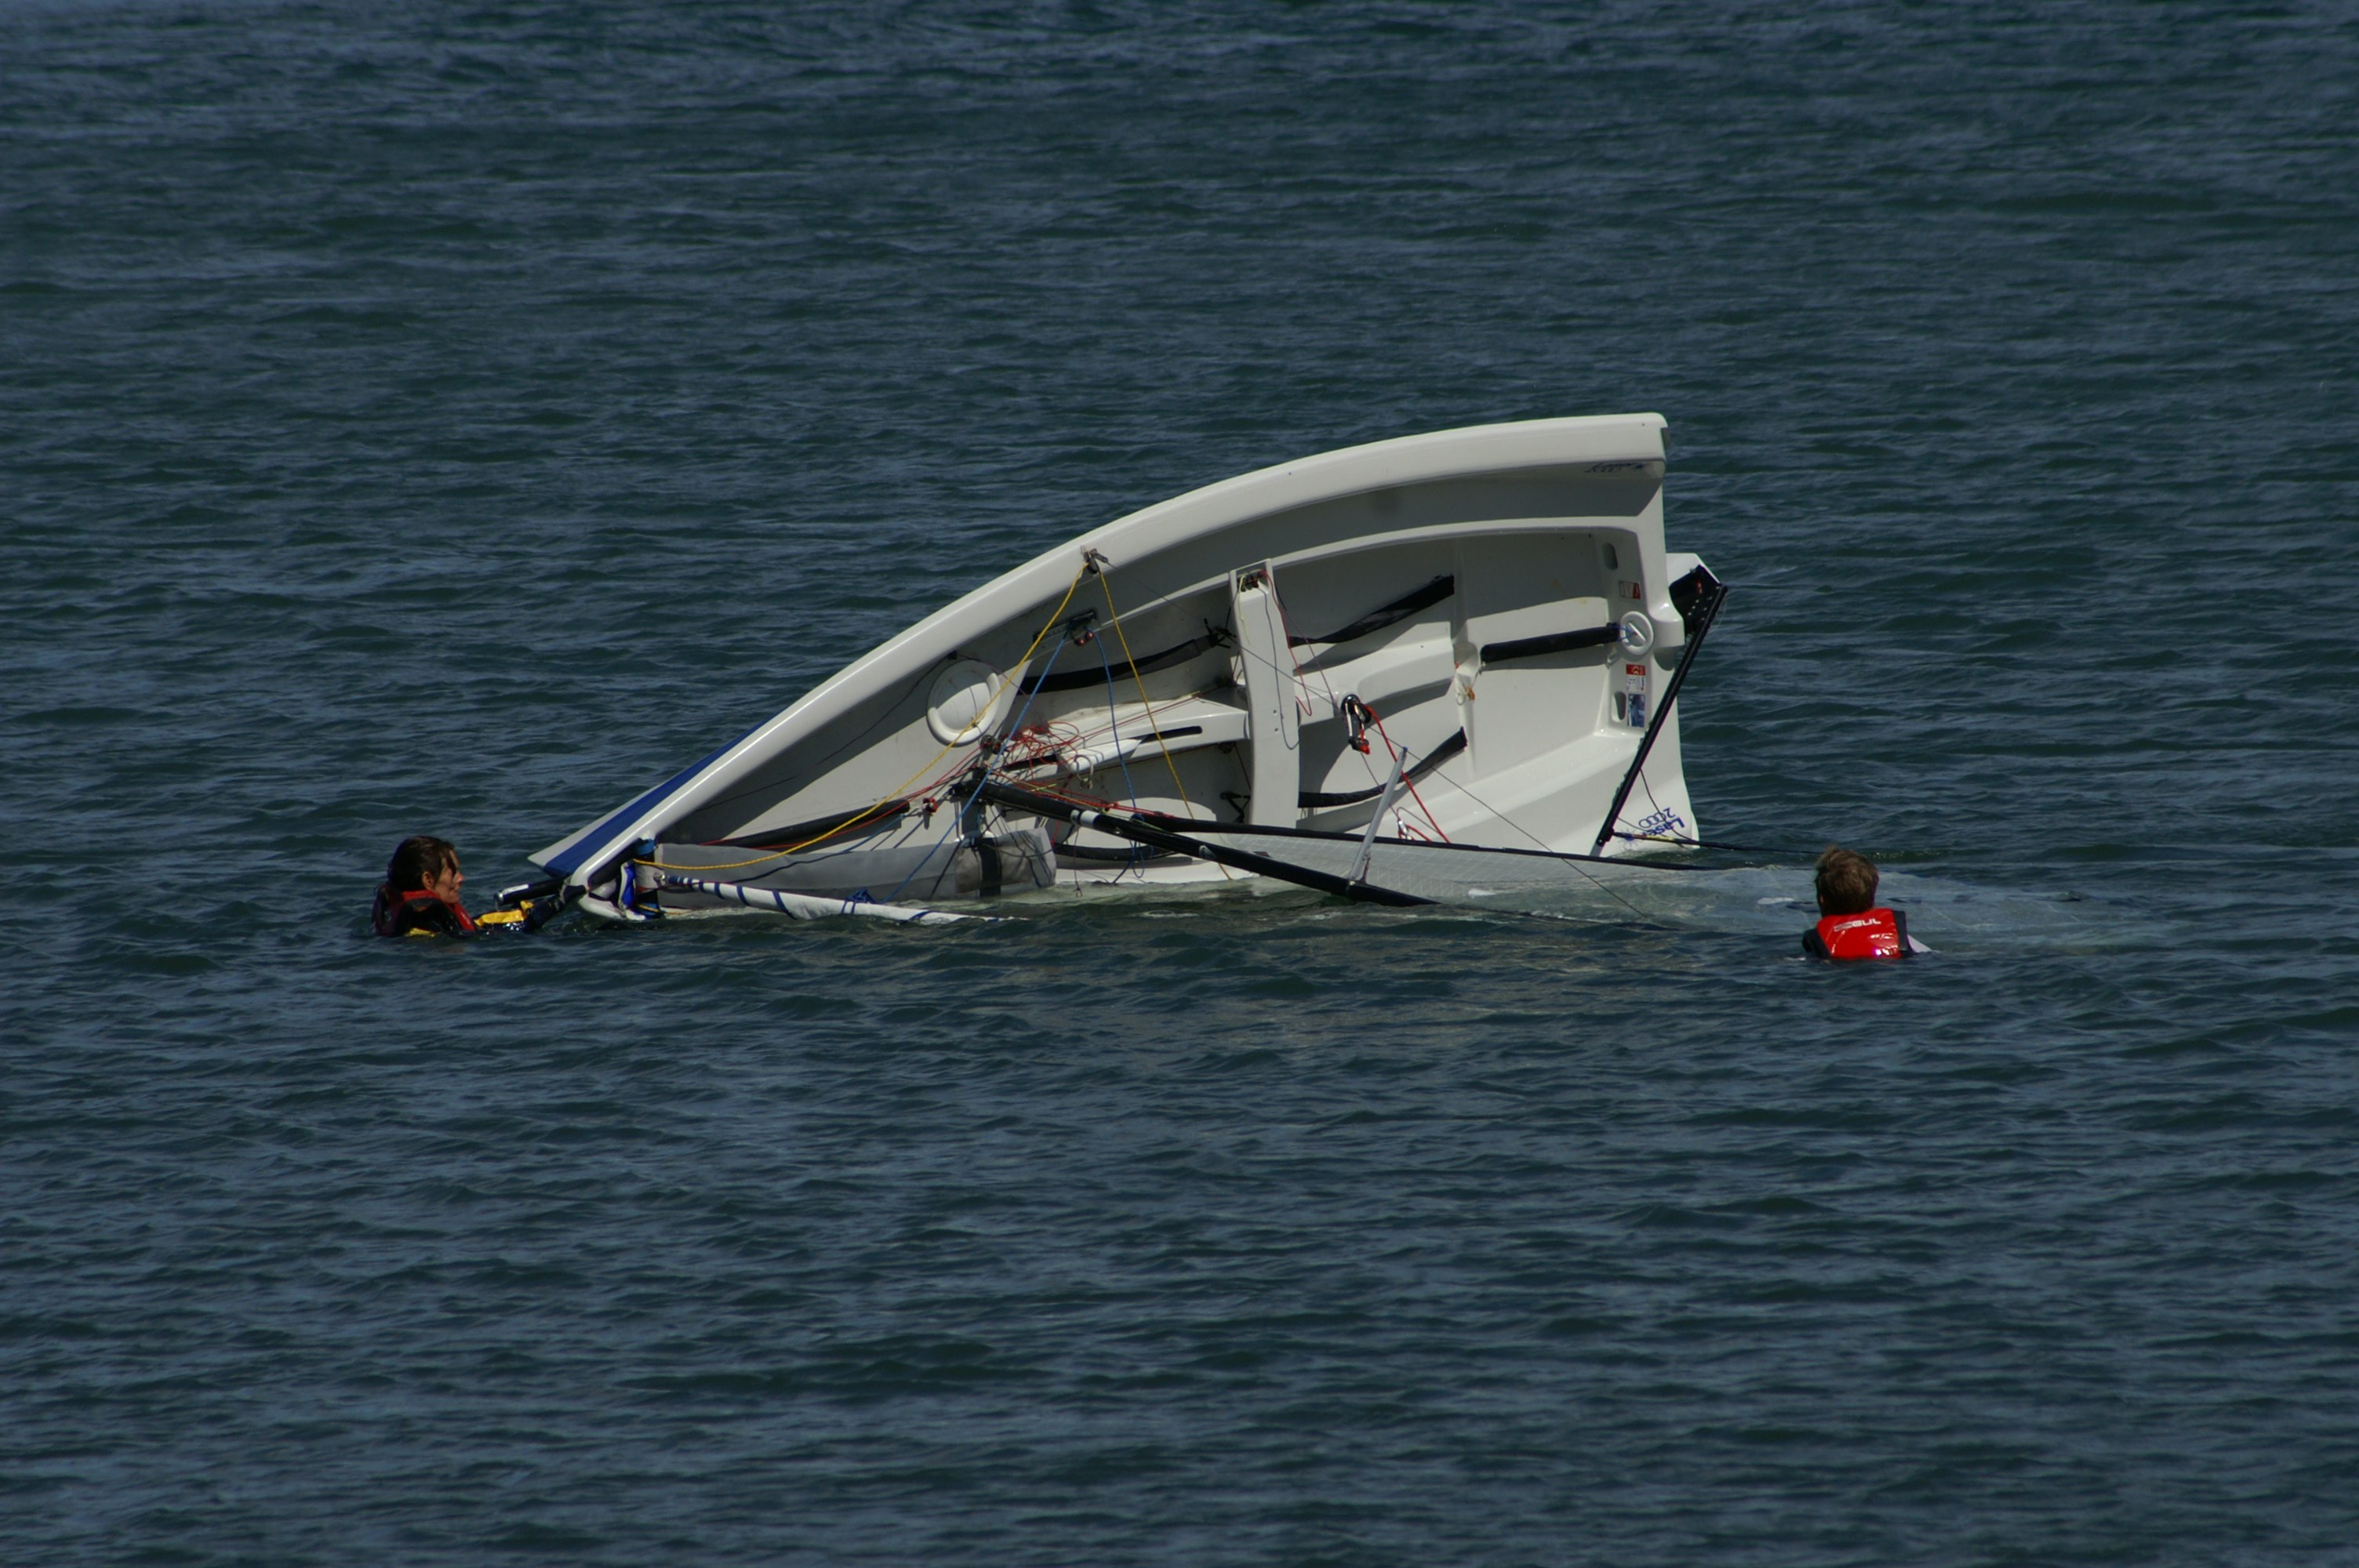 Tipping boat leaves people stranded in ocean